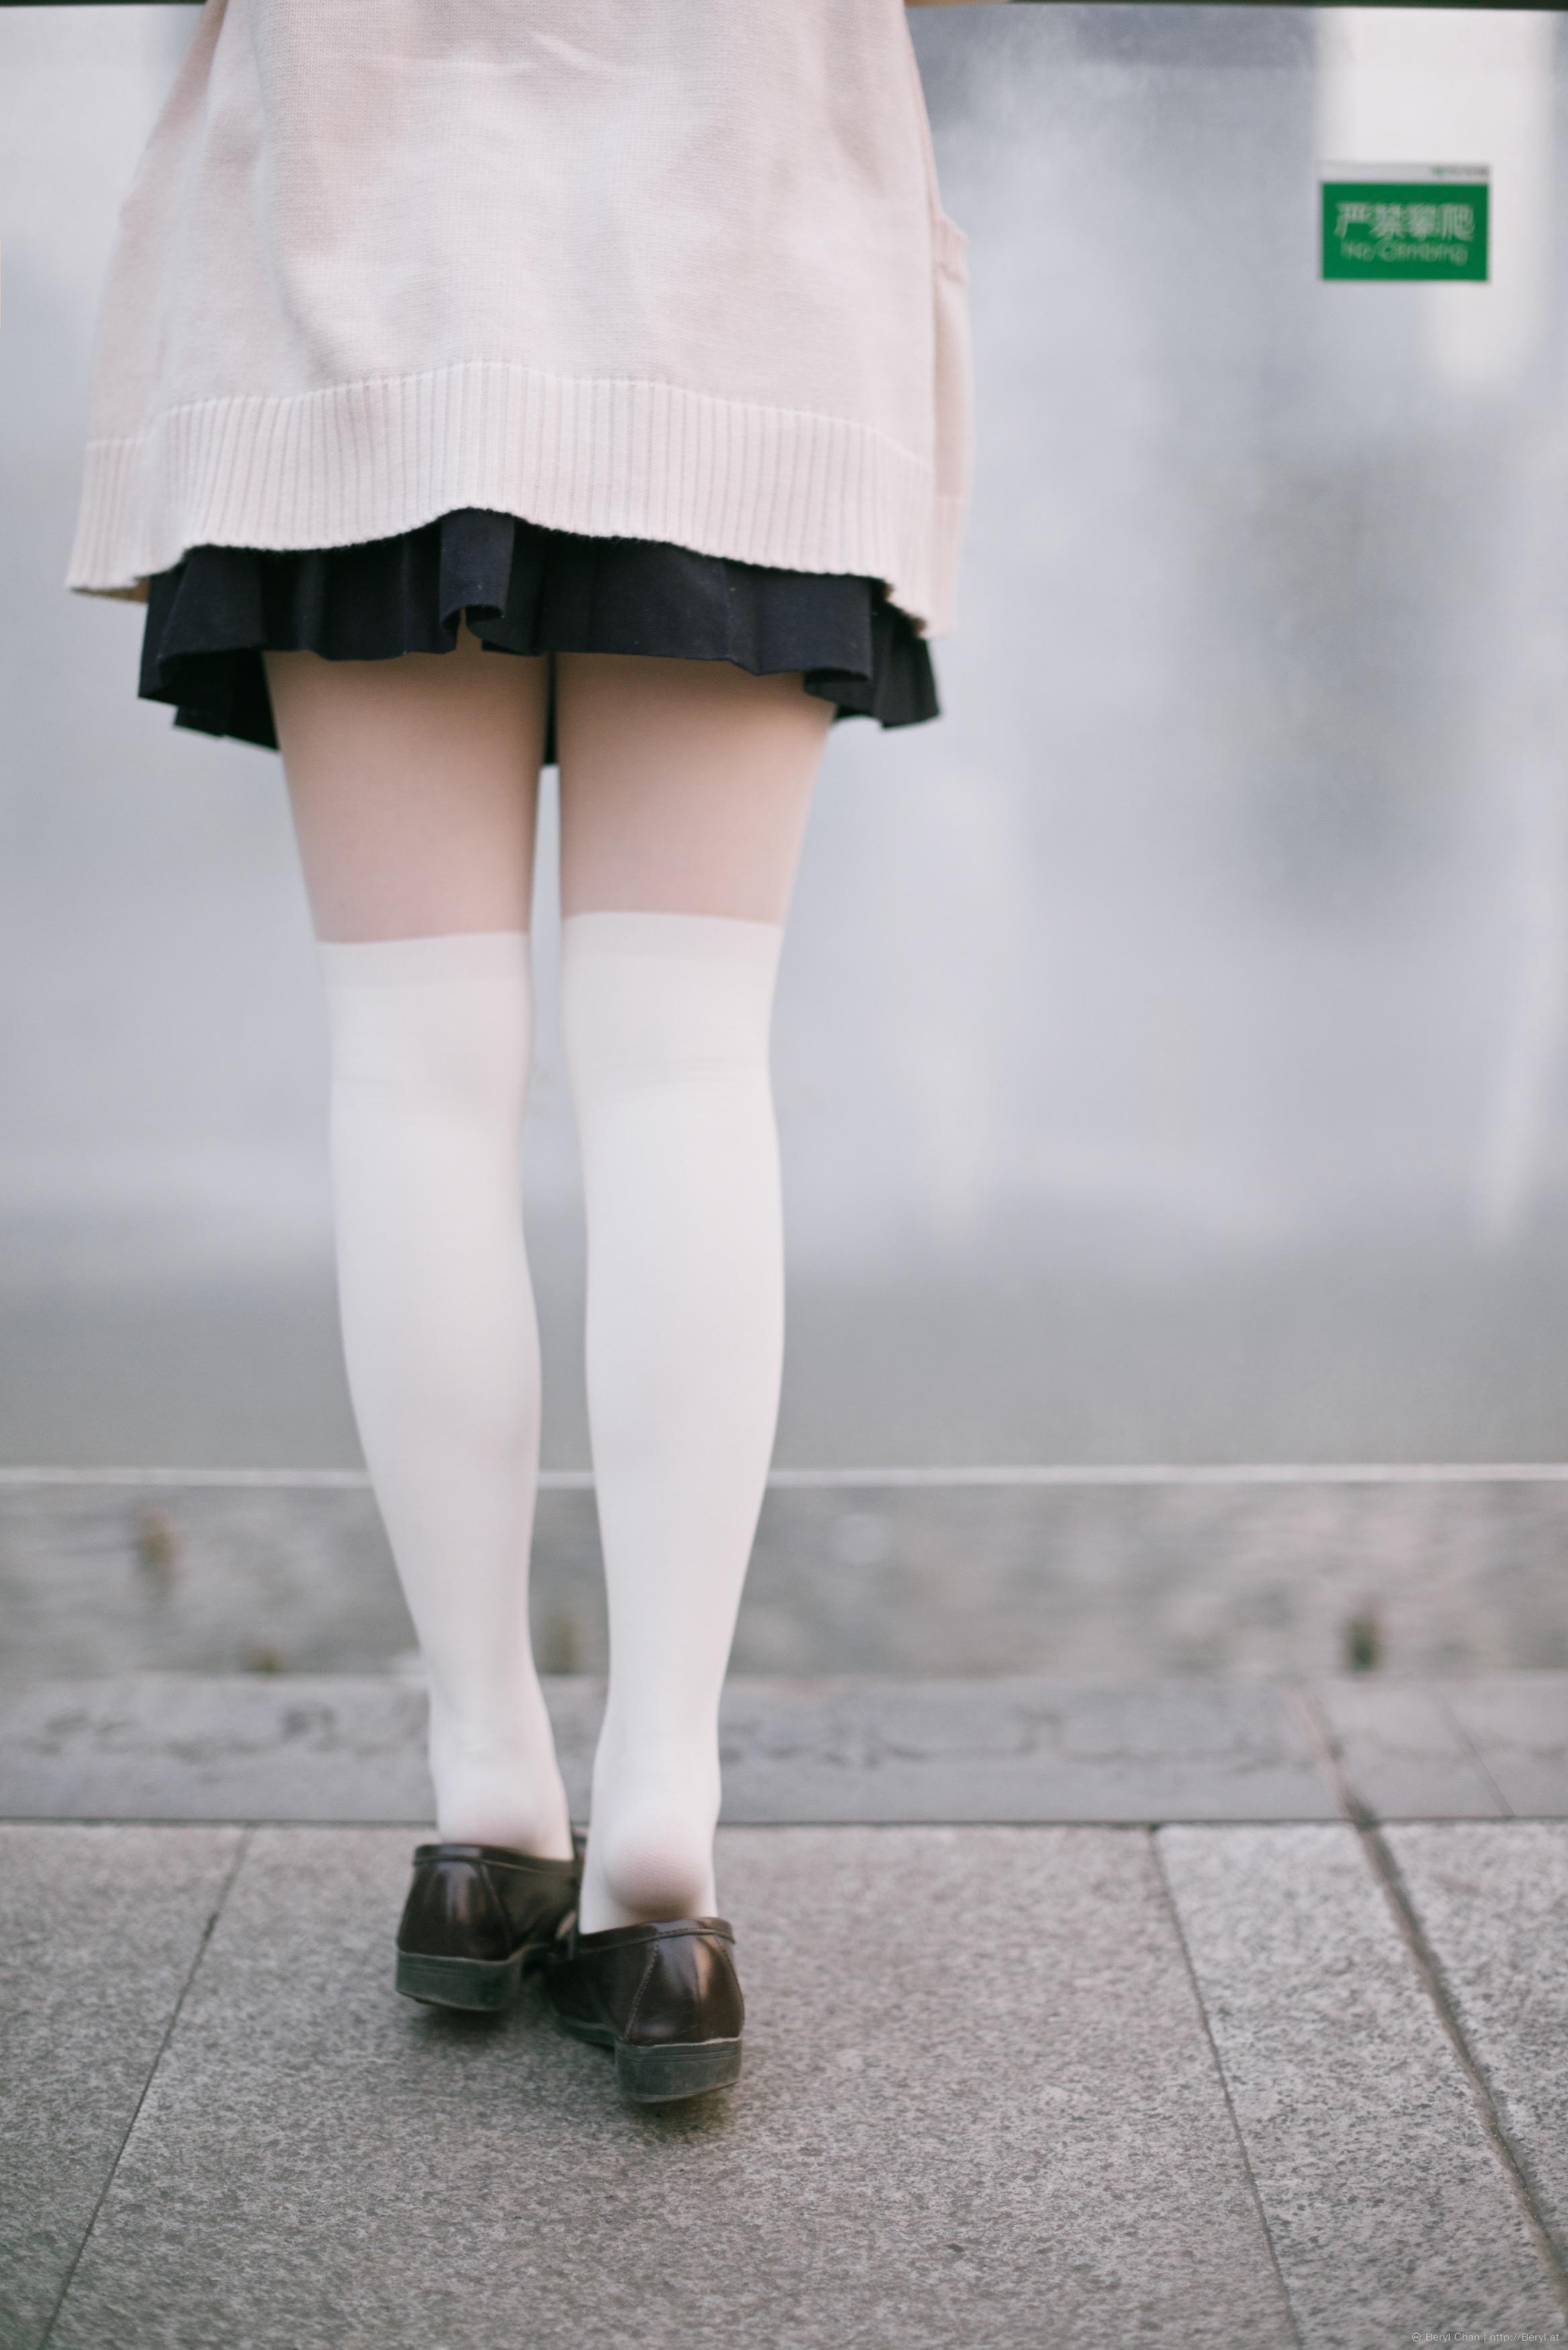 dae61c7da5 ... fashion, clothing, outerwear, human body, shoes, hands, back, legs,  bright, thigh, tiny, faceless, uniform, school, skirt, socks, tights,  kneehighsocks, ...